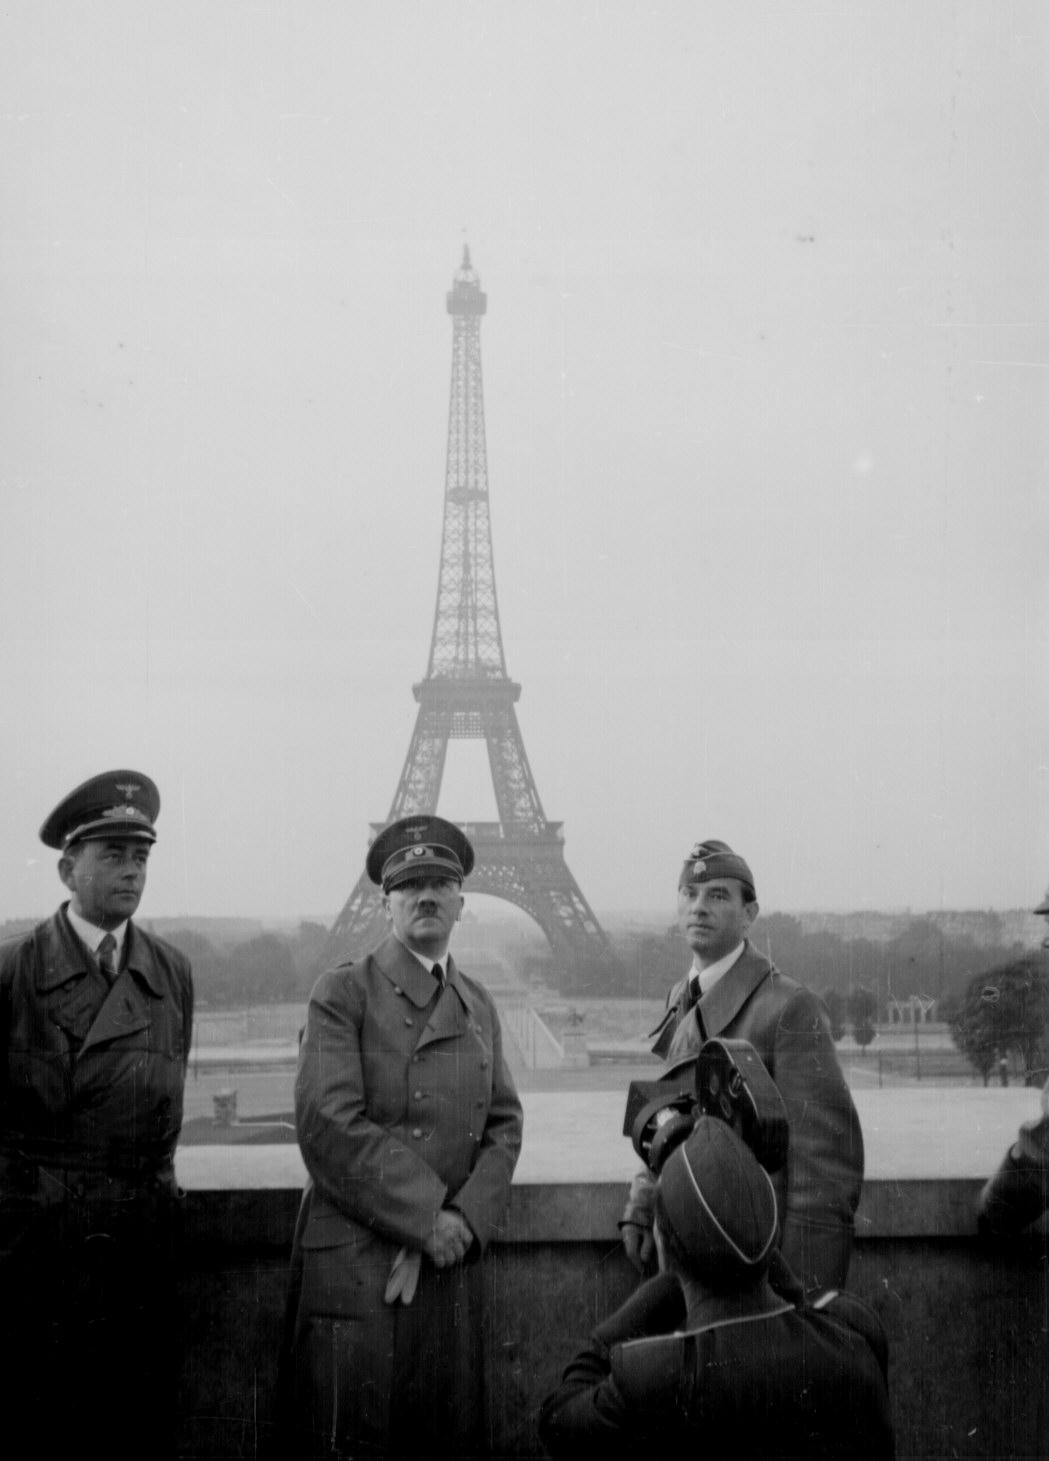 82 Adolf Hitler In Paris France June 23 1940 World War II on High School German Textbook